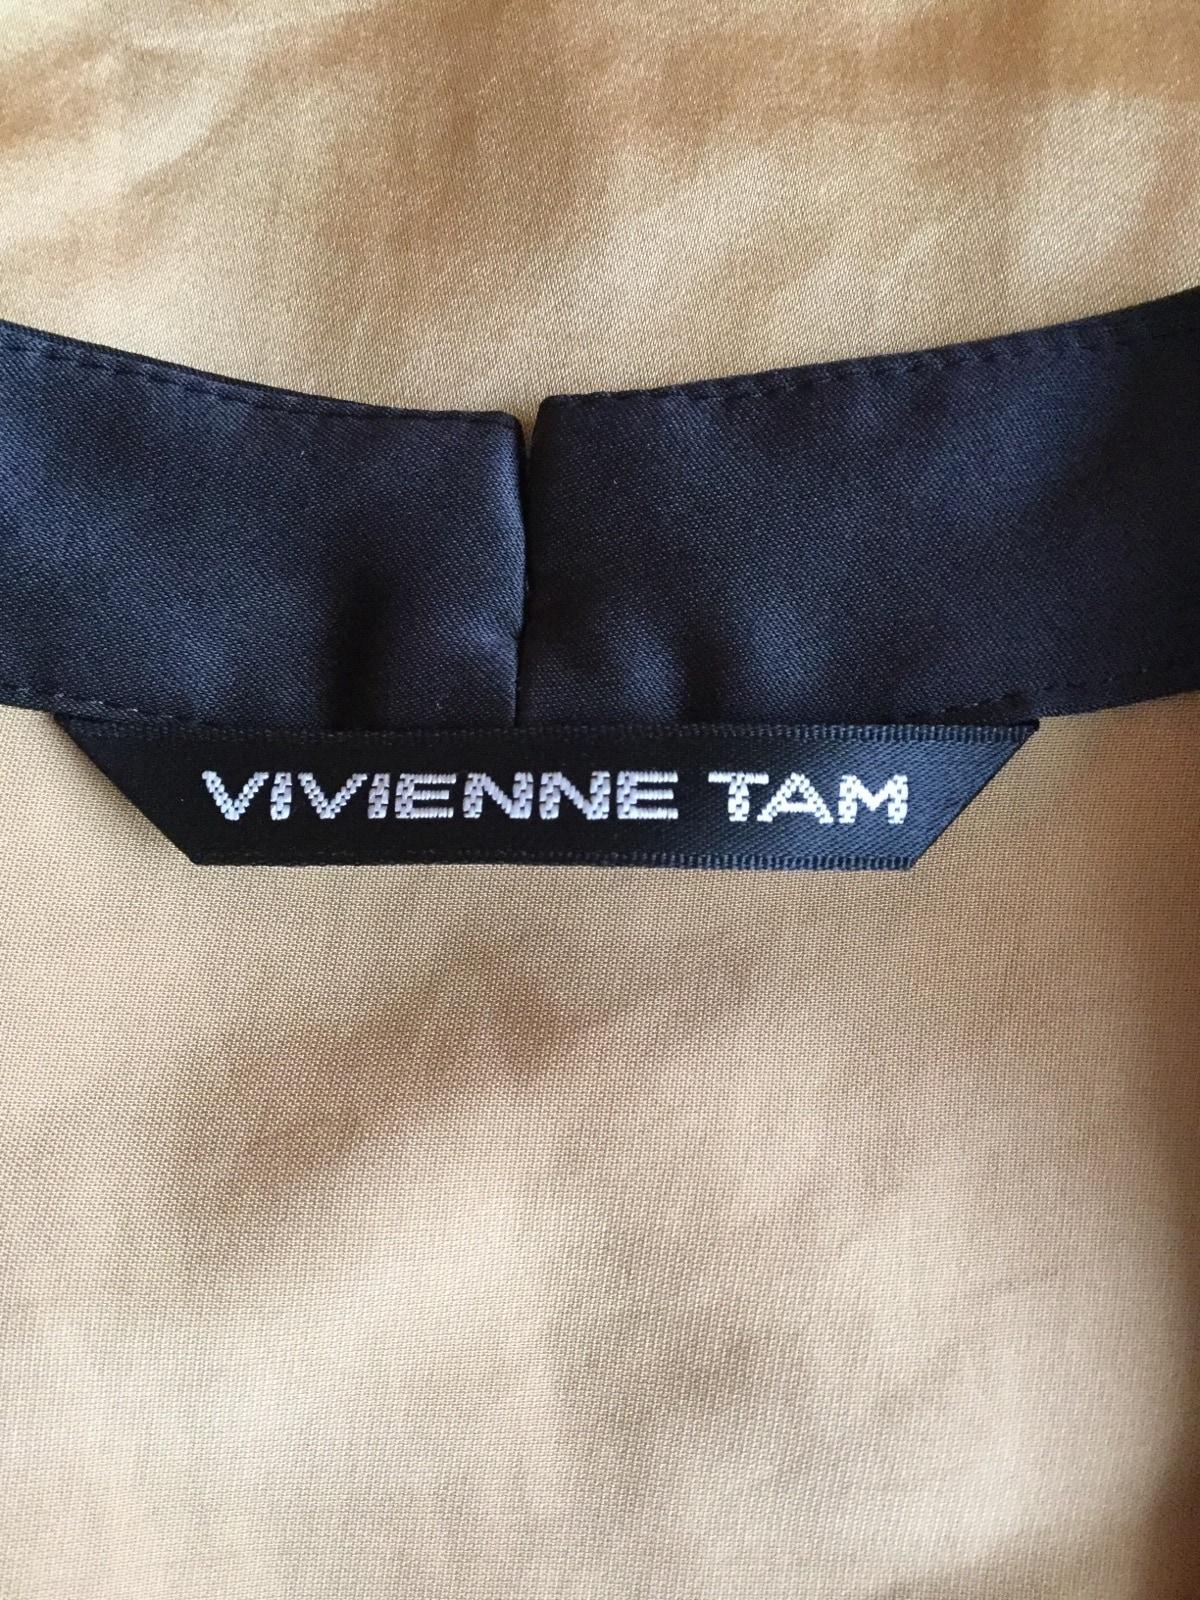 VIVIENNE TAM(ヴィヴィアンタム)のワンピース